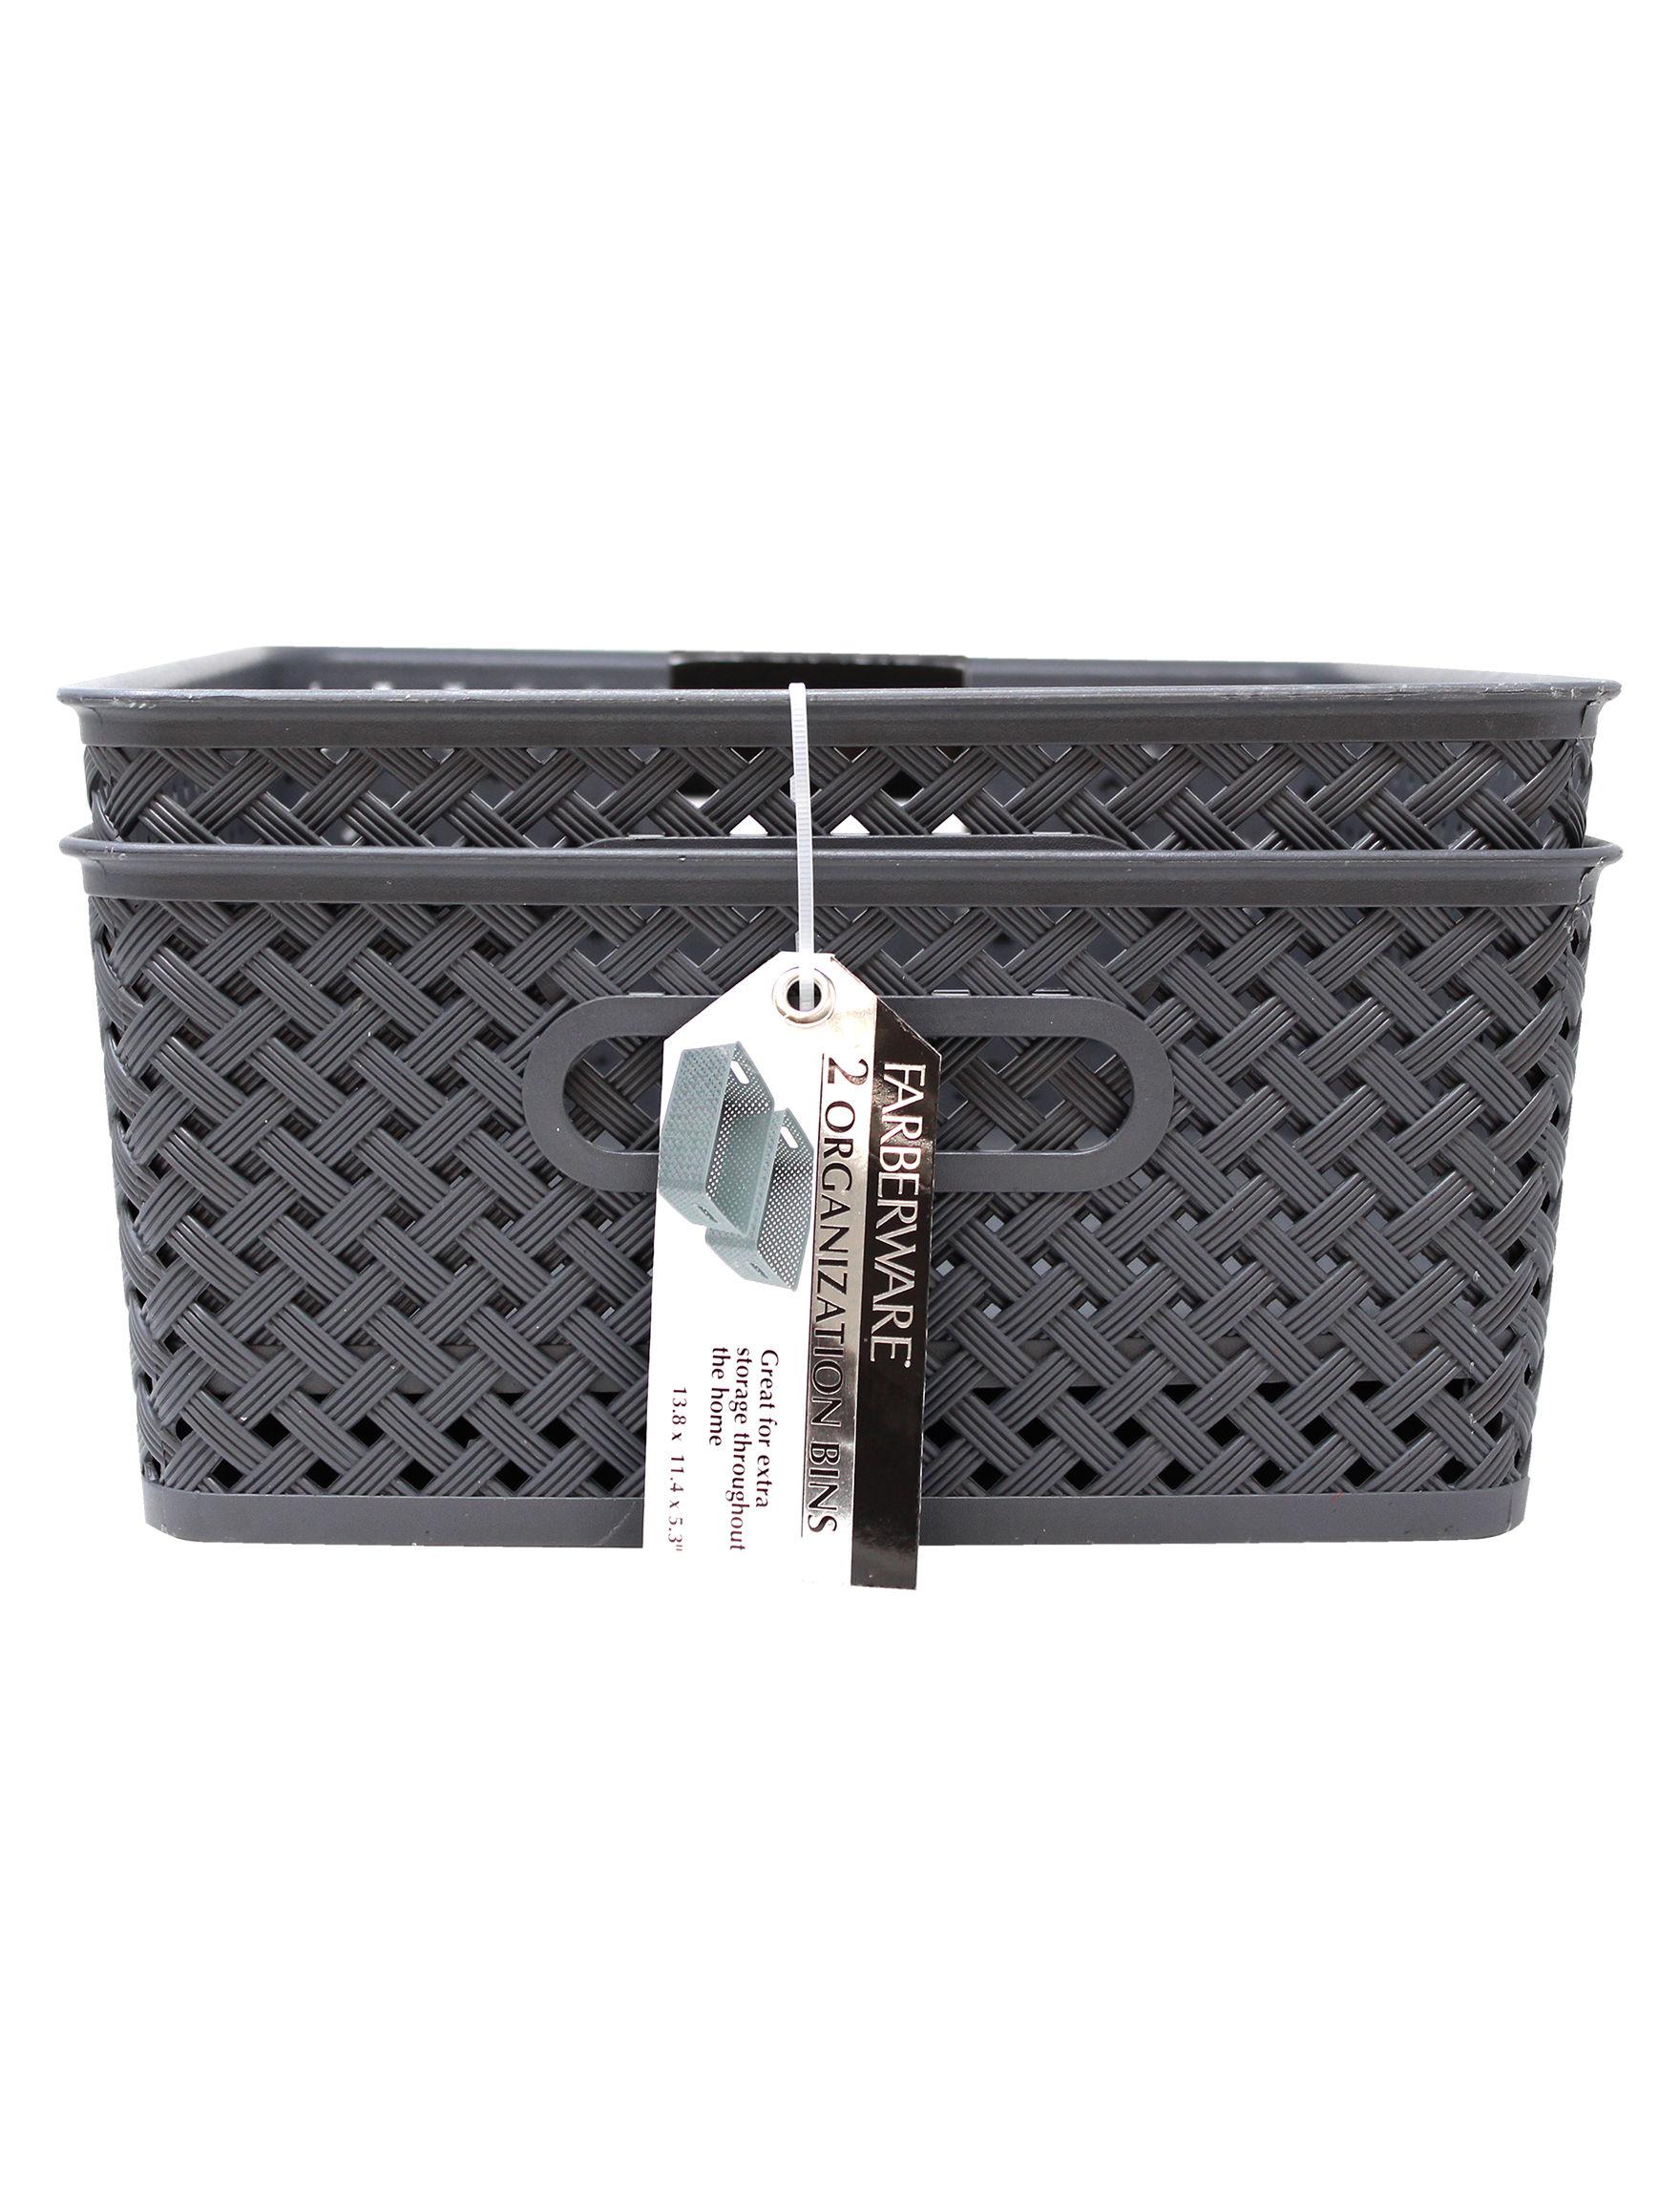 Farberware Grey Baskets Storage & Organization